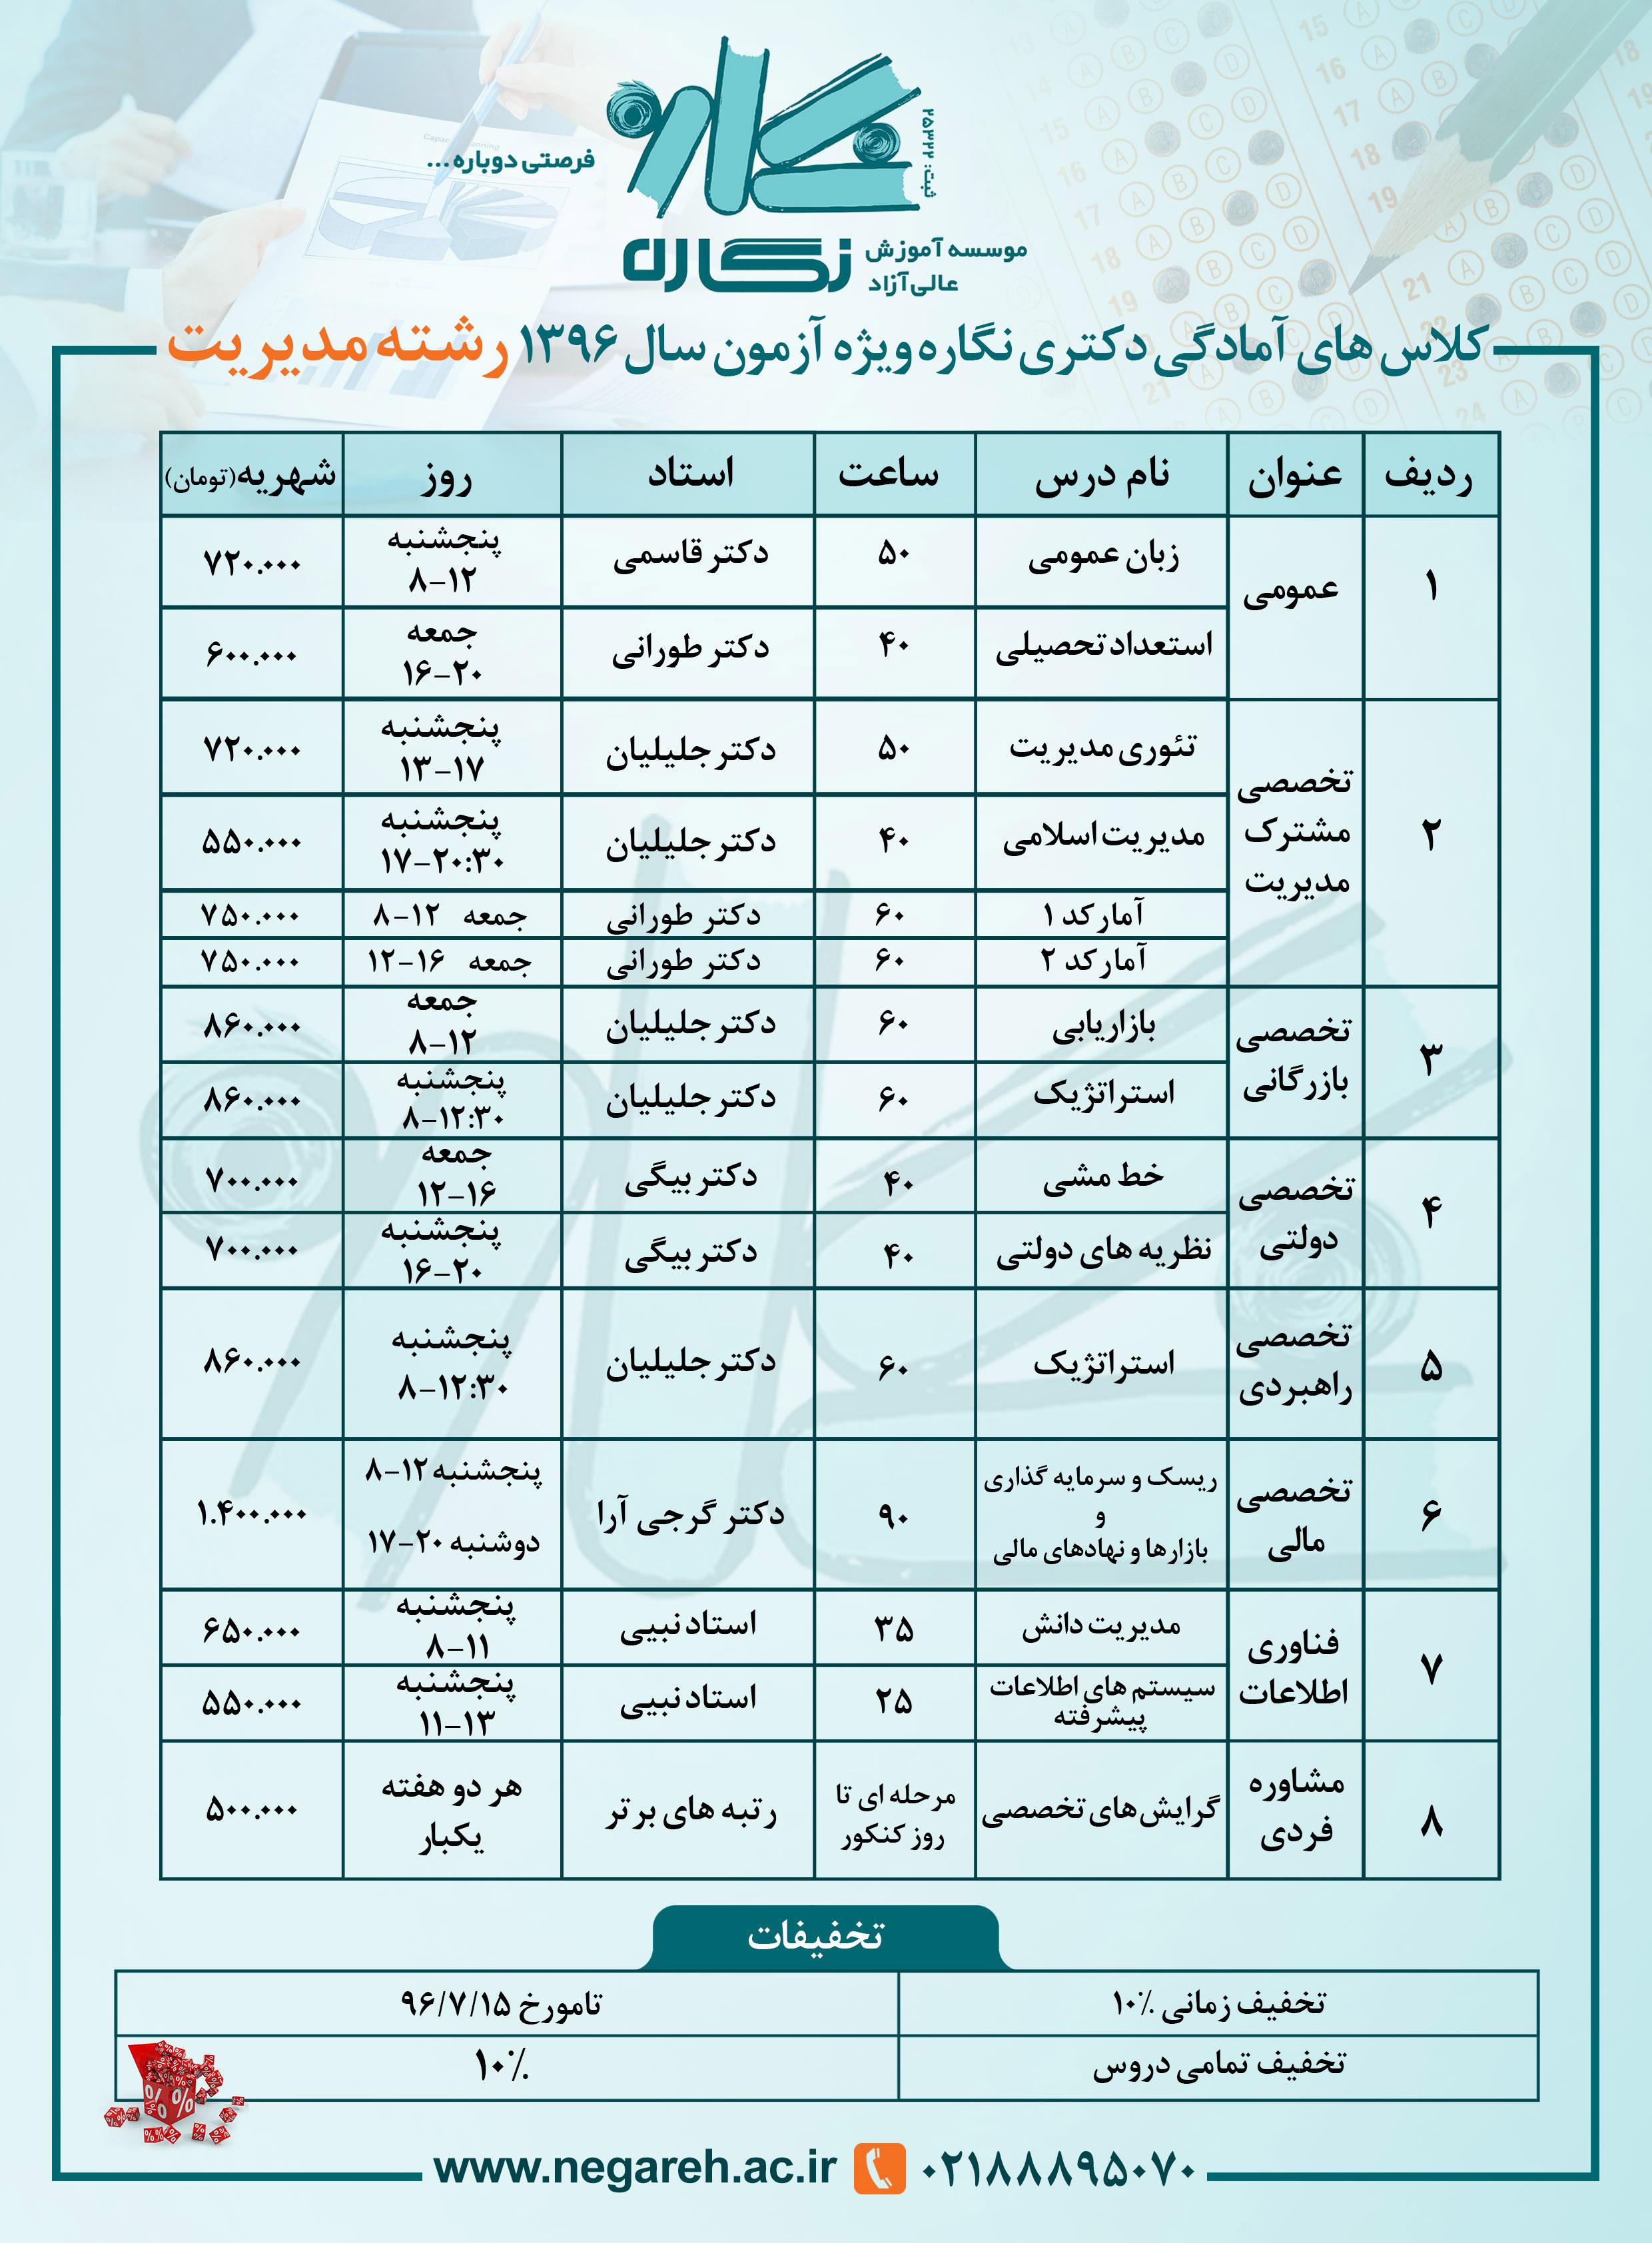 http://uupload.ir/files/e38z_دکتری_حضوری_مدیریت_سایت.jpg